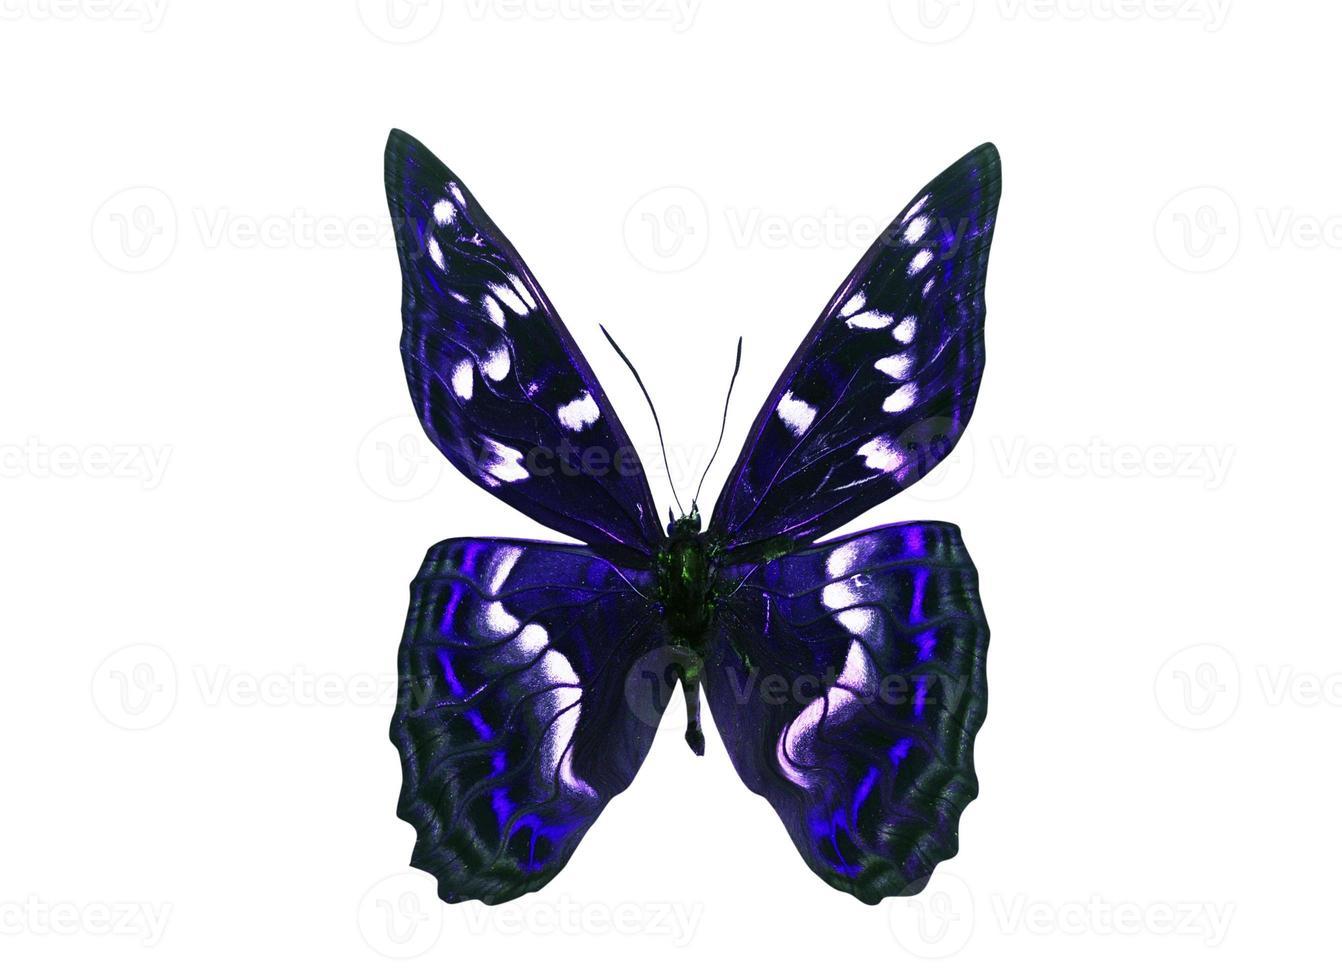 borboleta de cor escura com asas violetas. isolado no fundo branco foto